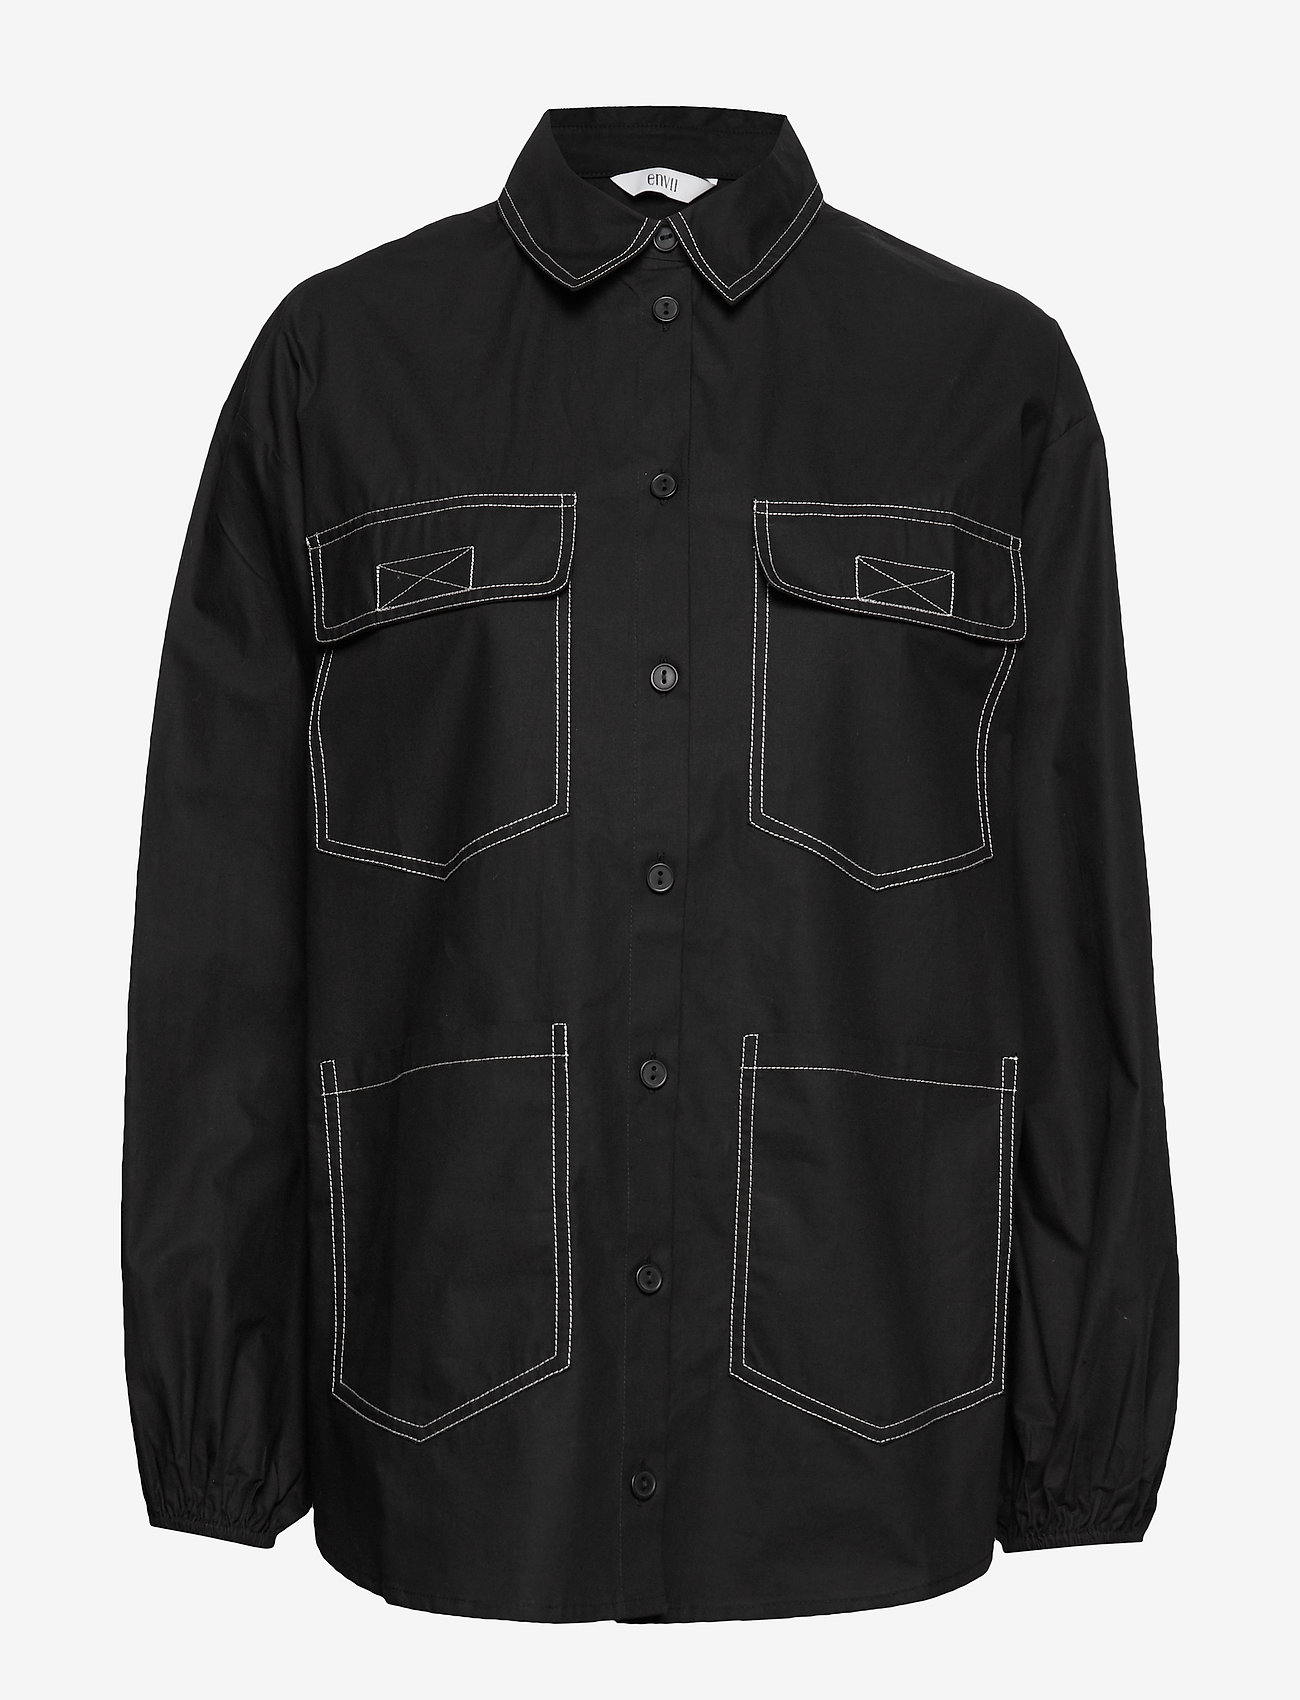 Envii Entopaz Ls Shirt 6691 - Chemisier & Chemises Black